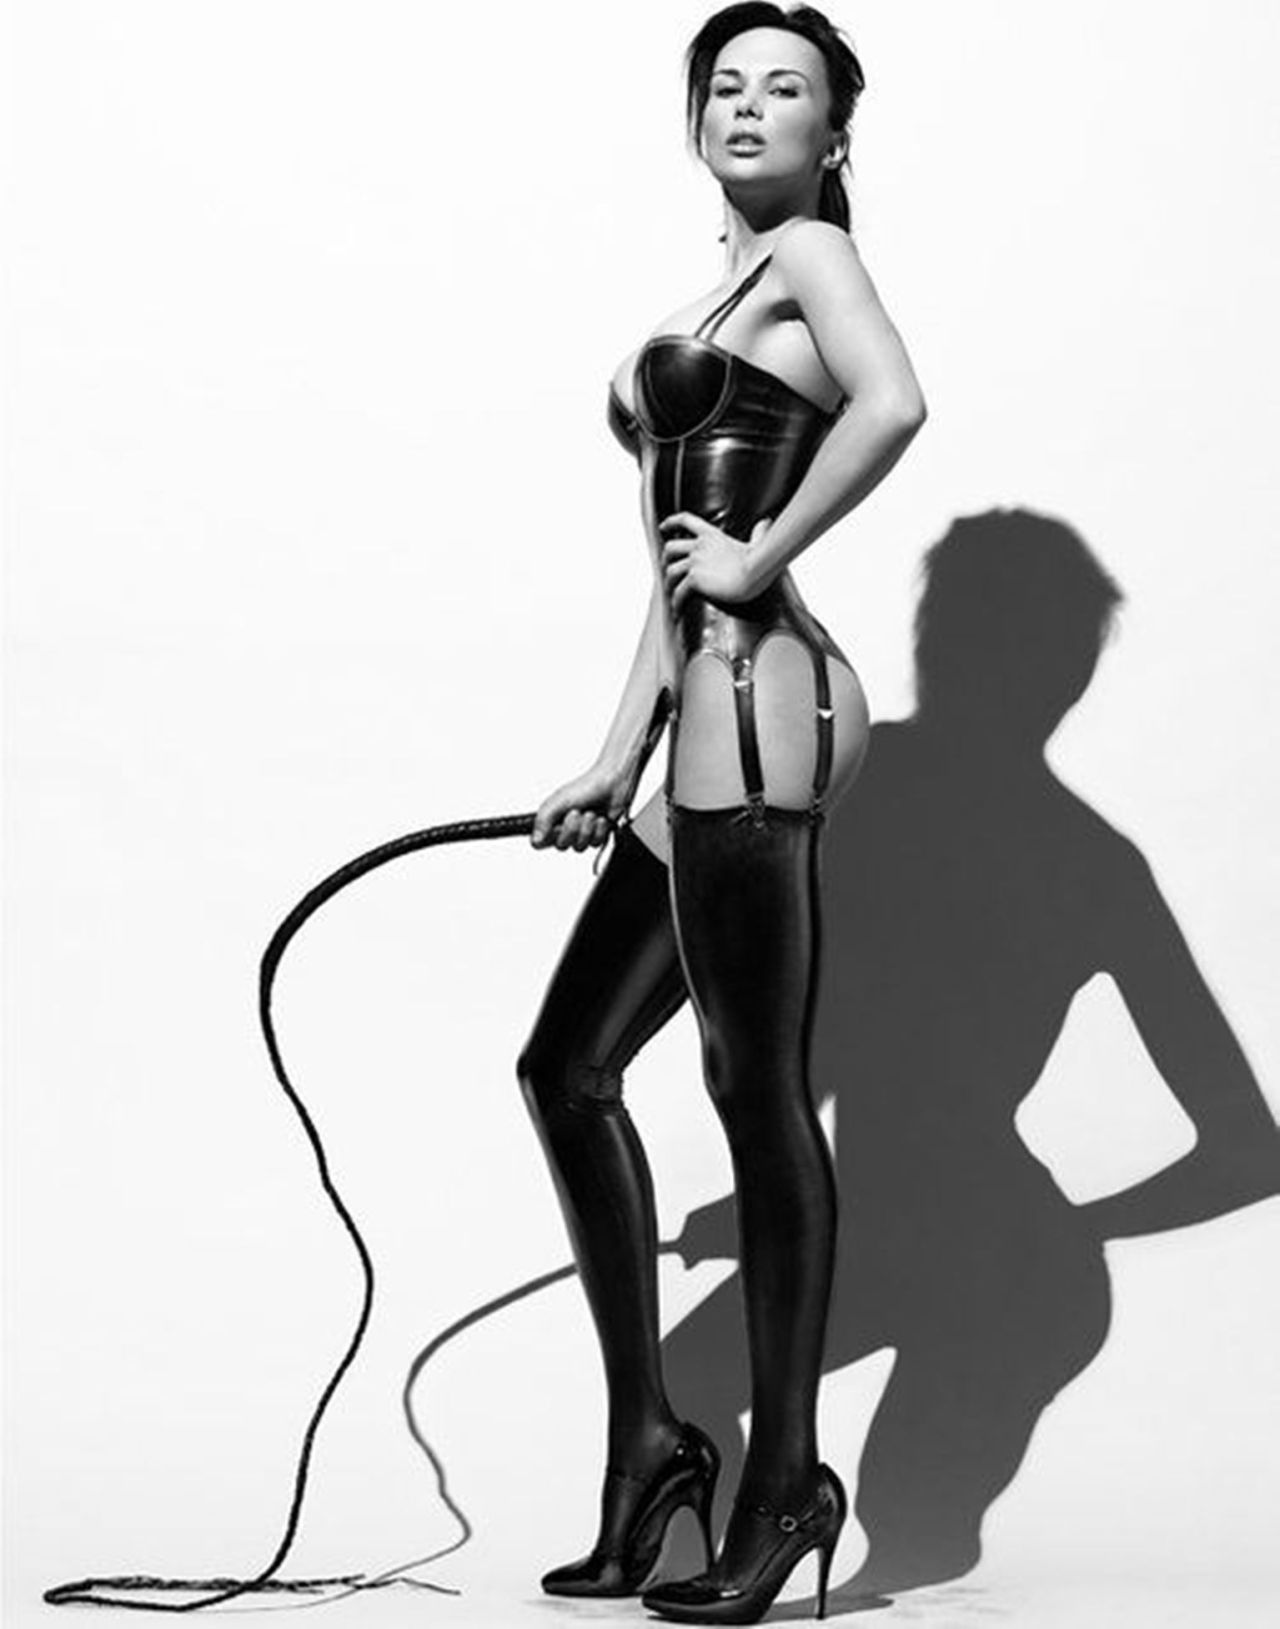 Садо мазо девушка доминирует 1 фотография